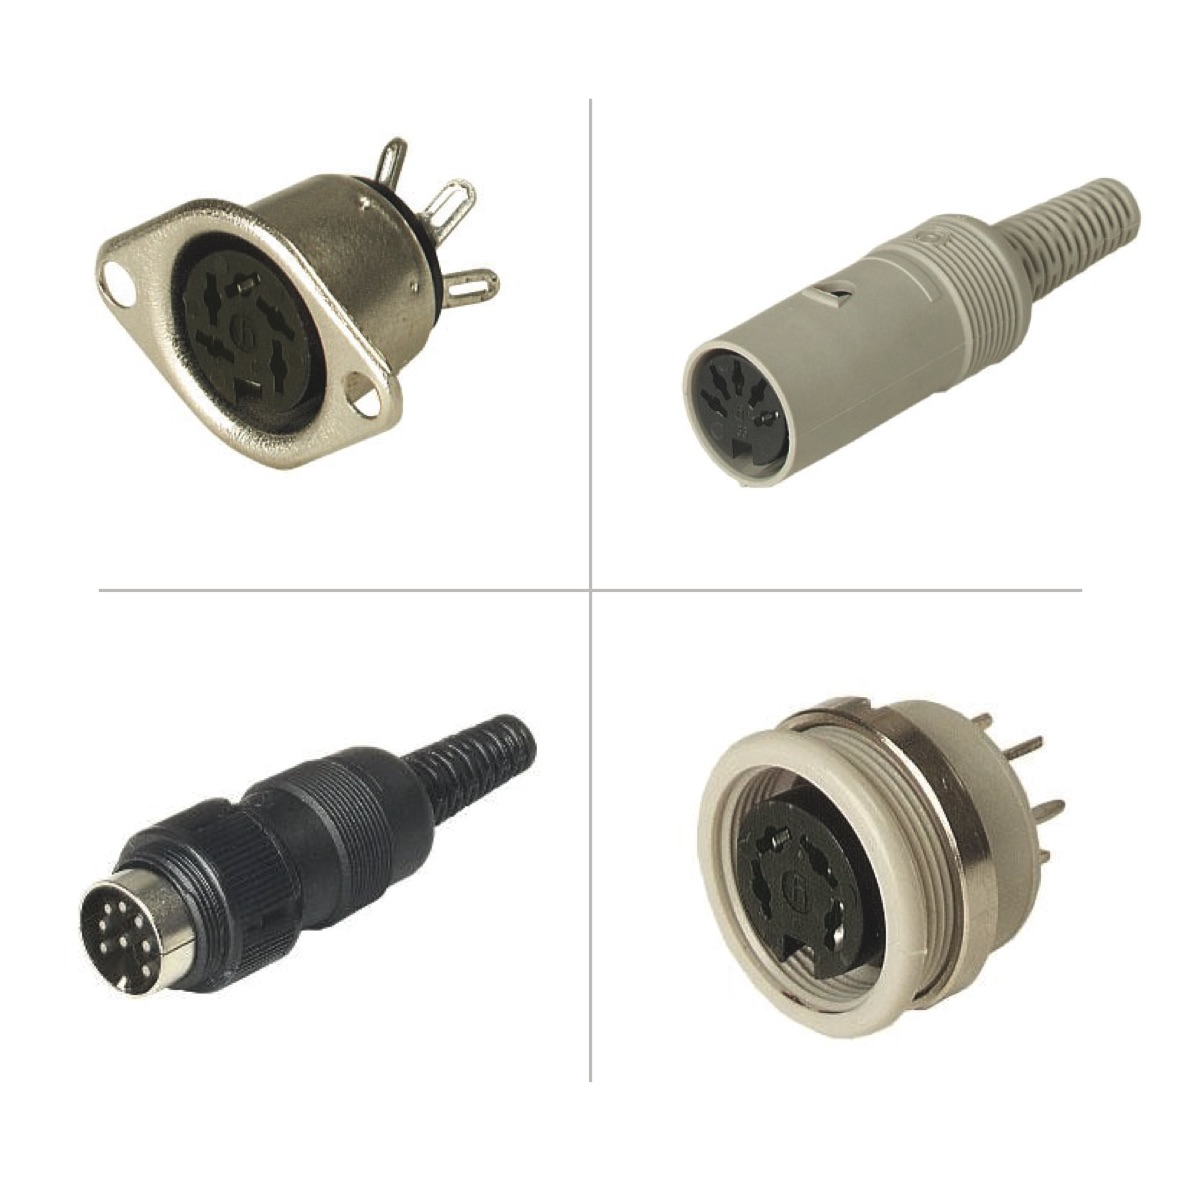 Hirschmann DIN EN 60 130-09 (MAK/MAS) Circular Connectors